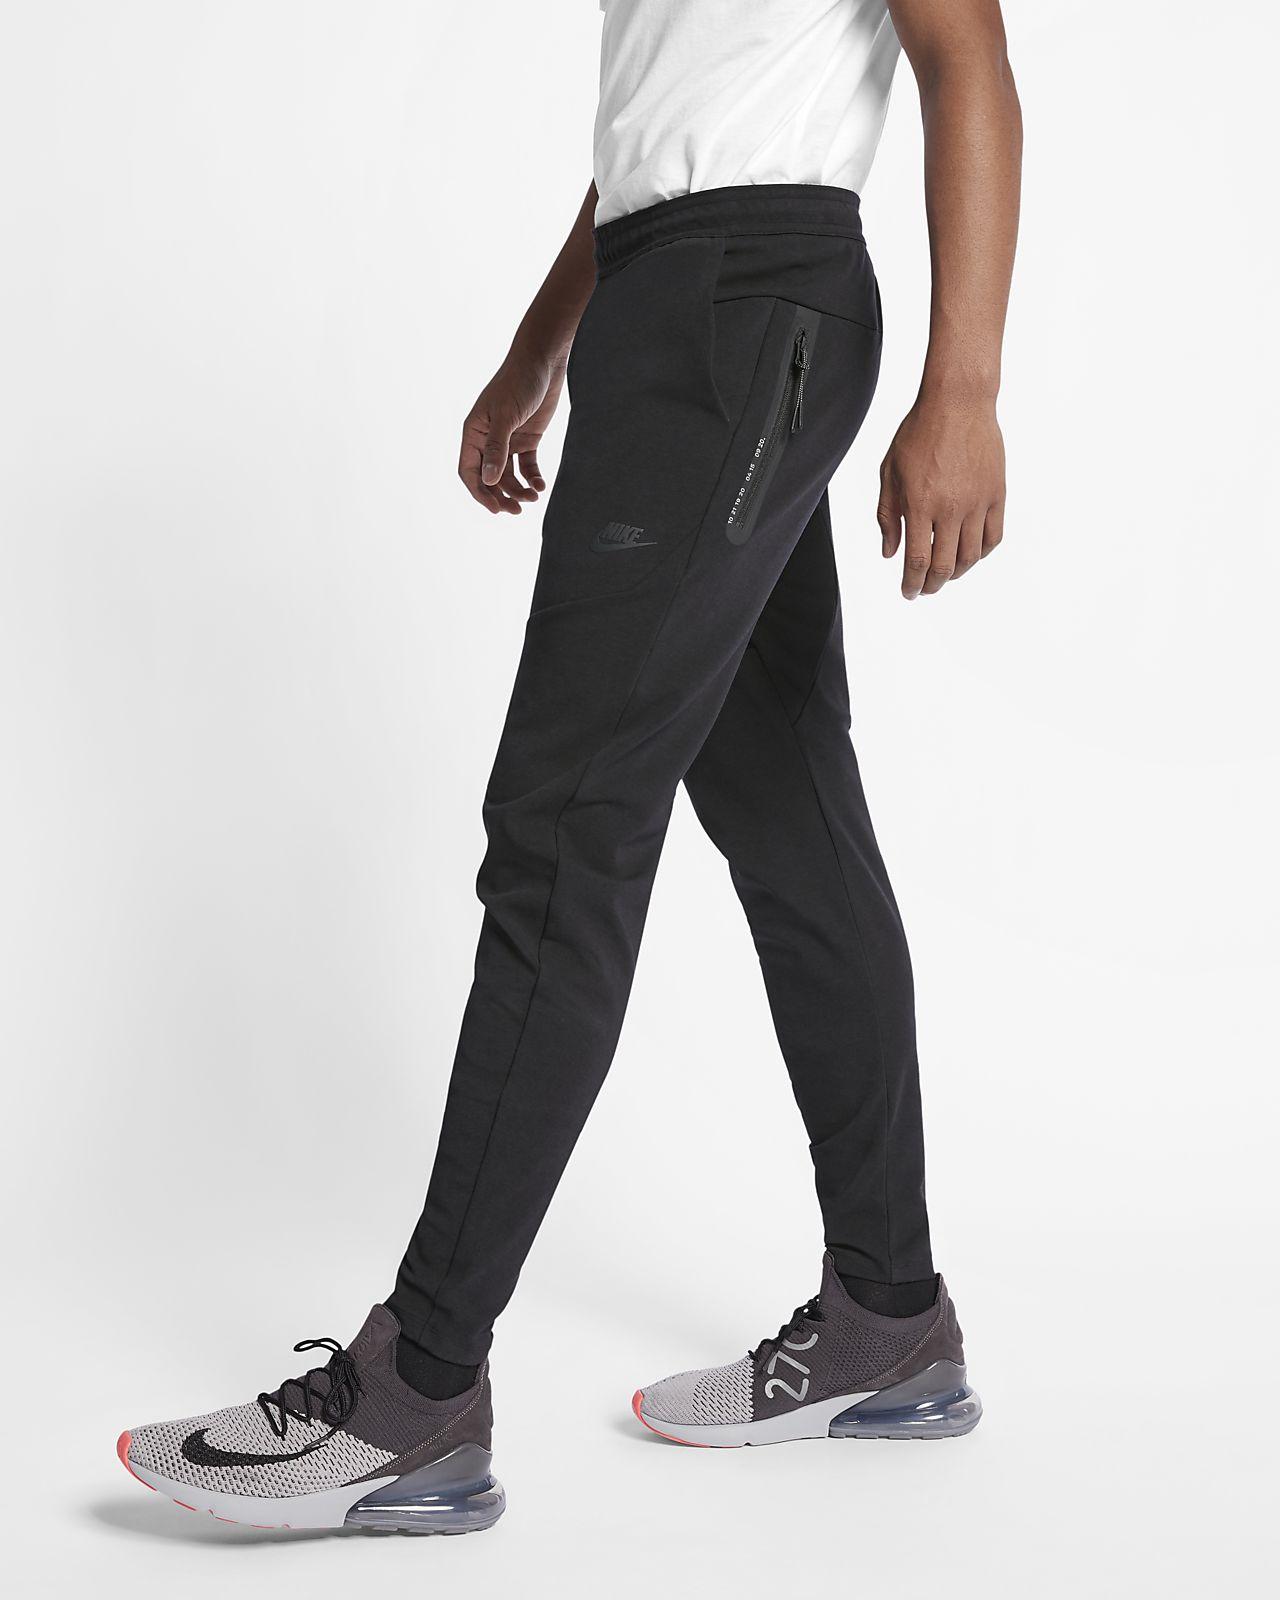 Byxor Nike Sportswear Tech Pack för män